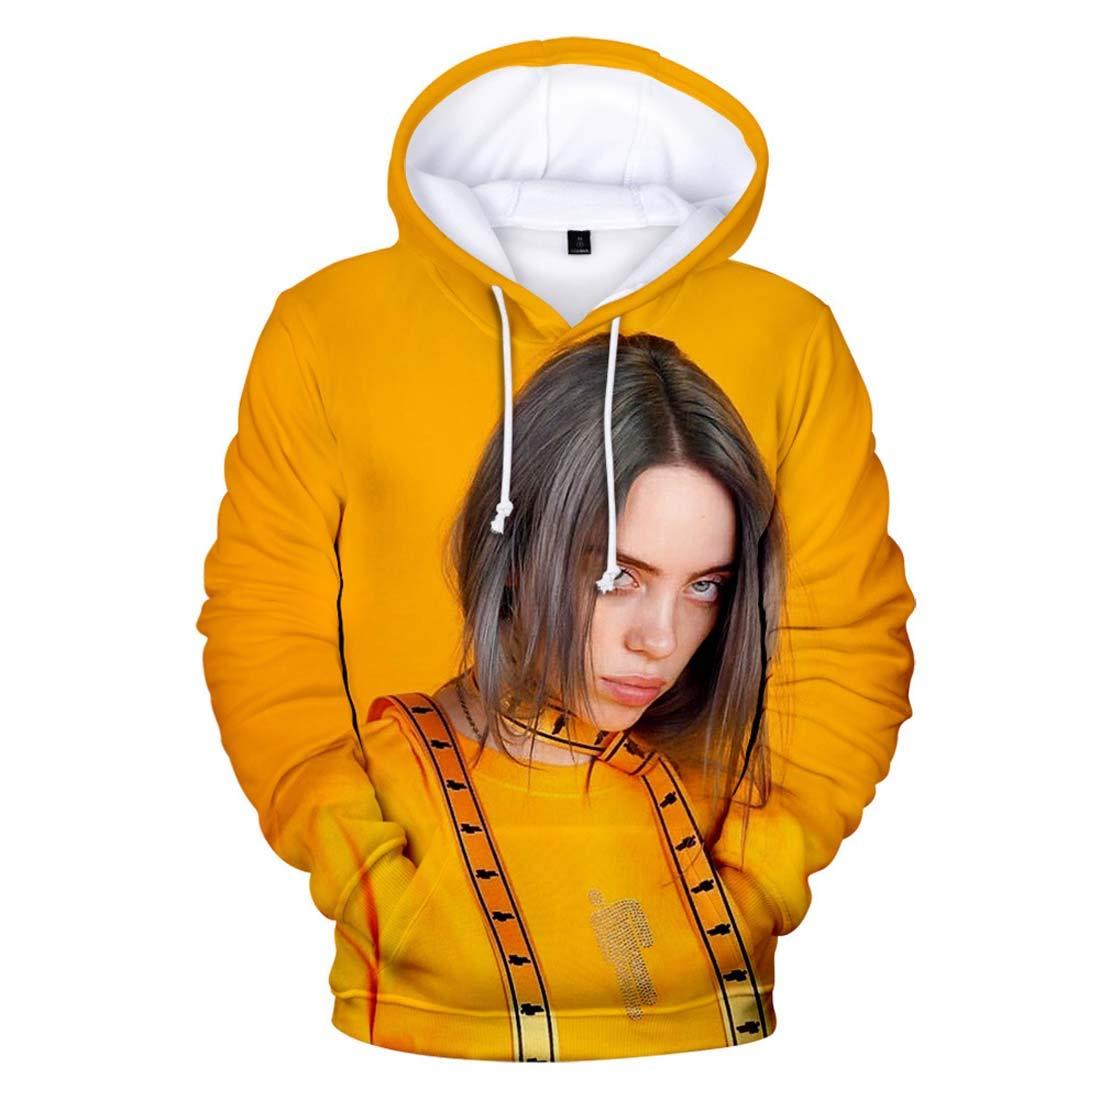 Flyself Unisex Billie Eilish Fans Felpa con Cappuccio Stampata 3D Hip Pop Cool Pullover Instagram Sweatshirt Streetwear per Uomo Donna Teen